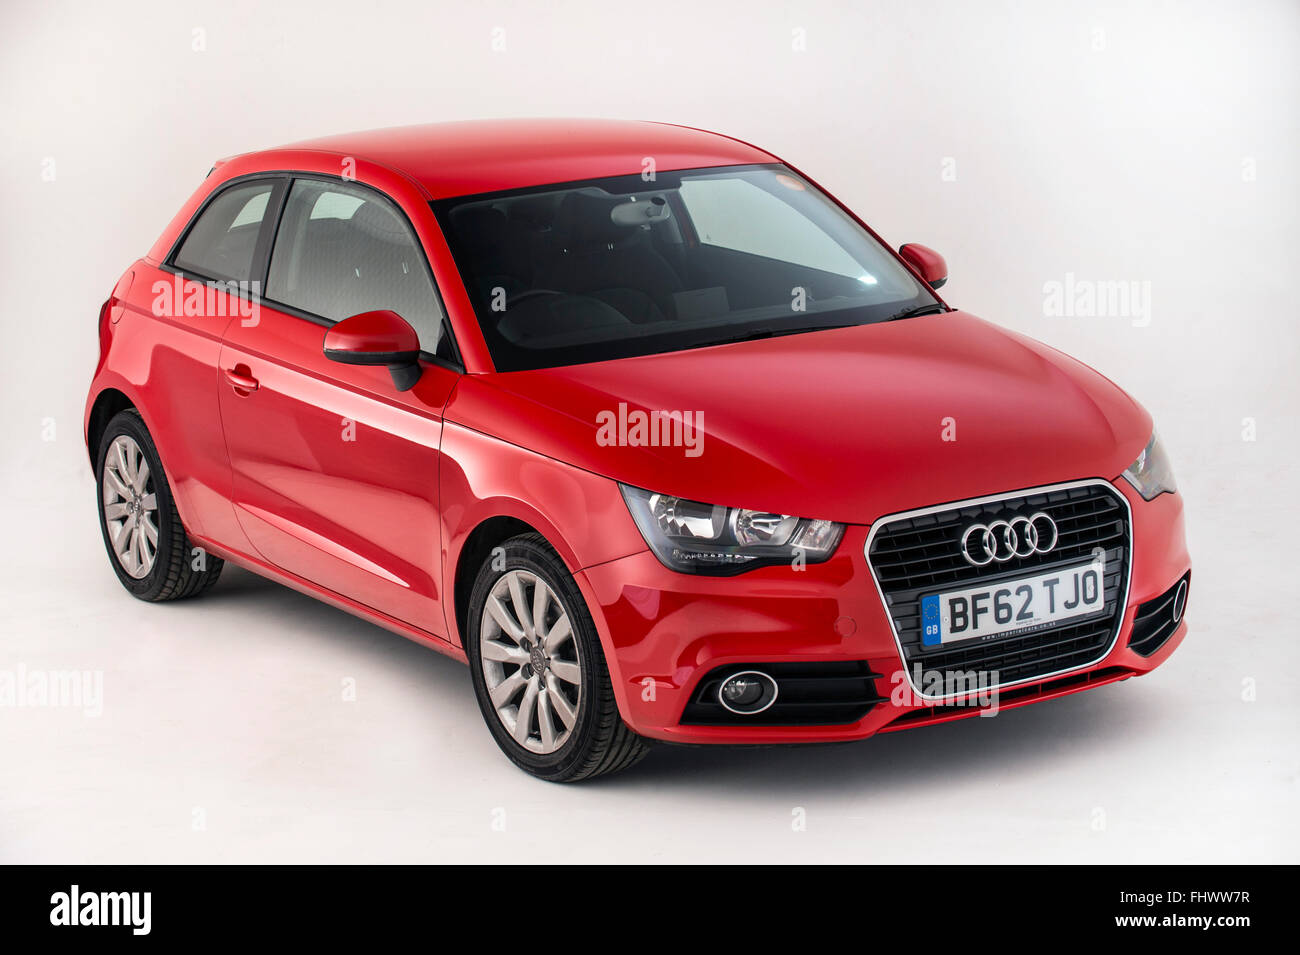 2012 Audi A1 - Stock Image